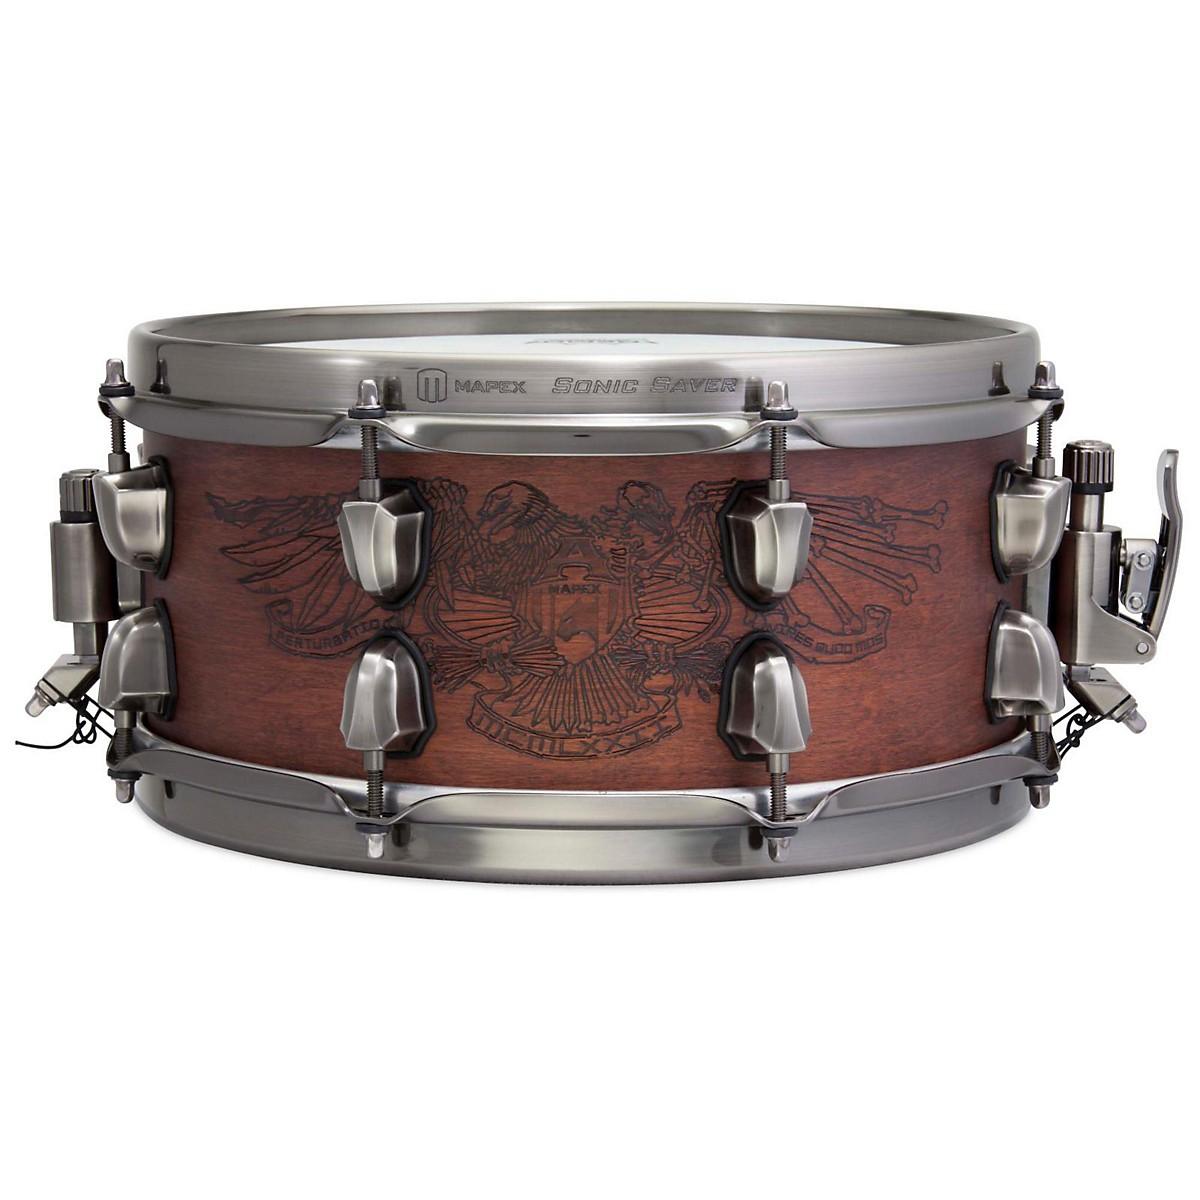 Mapex Warbird Chris Adler Artist Inspired Black Panther Snare Drum